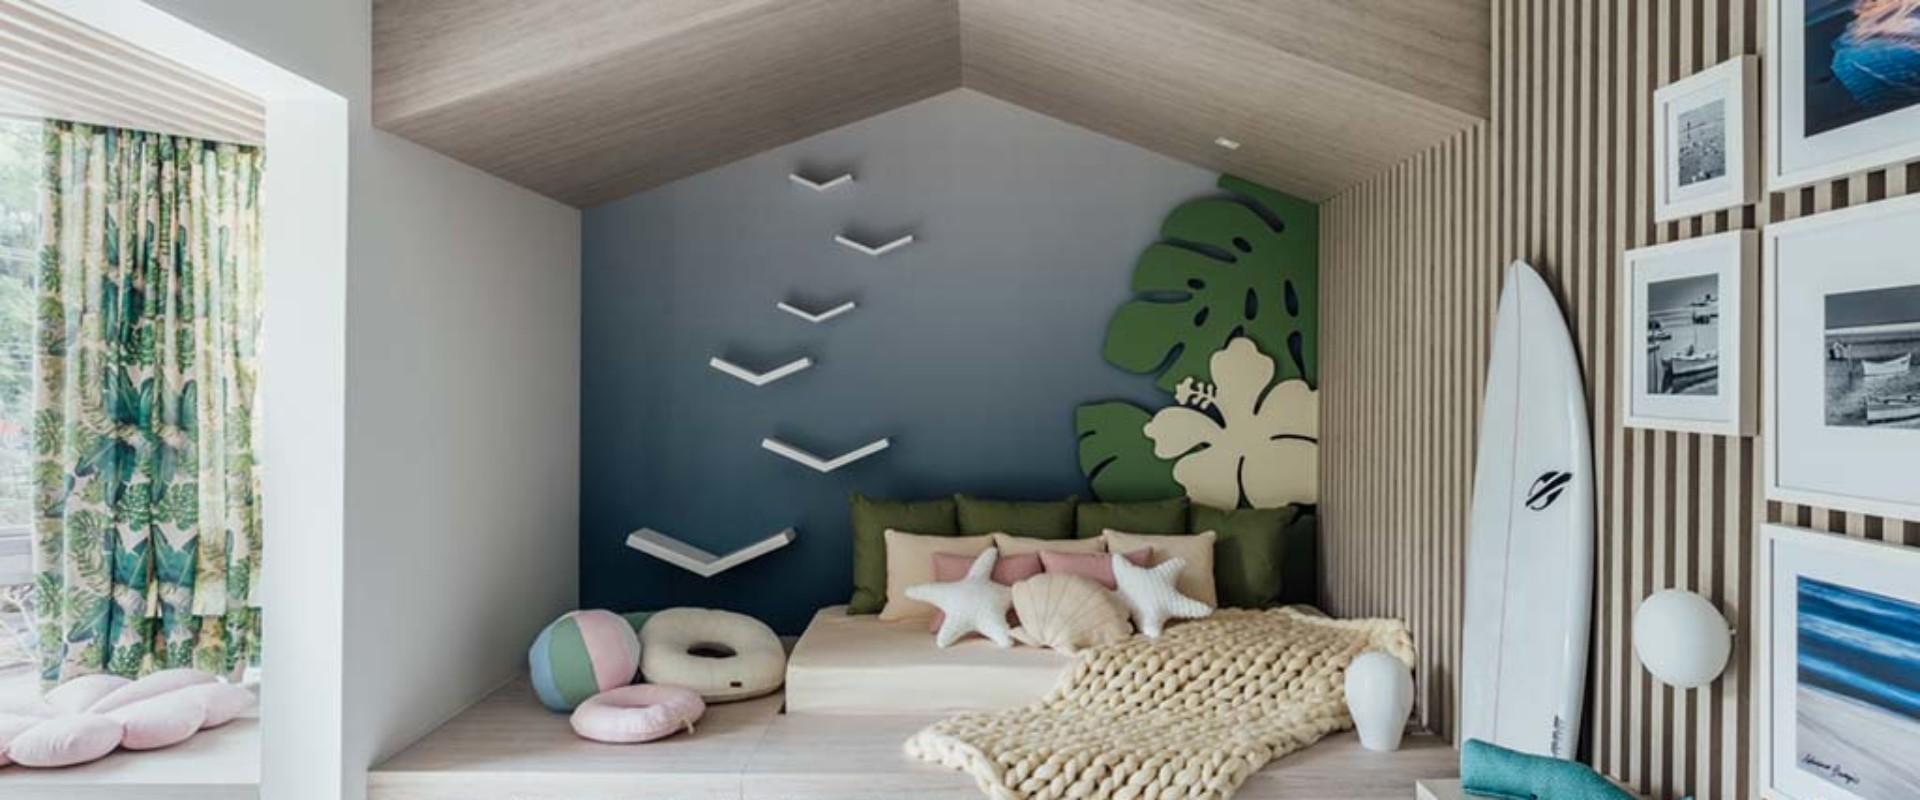 dormitorio-da-menina-surfista